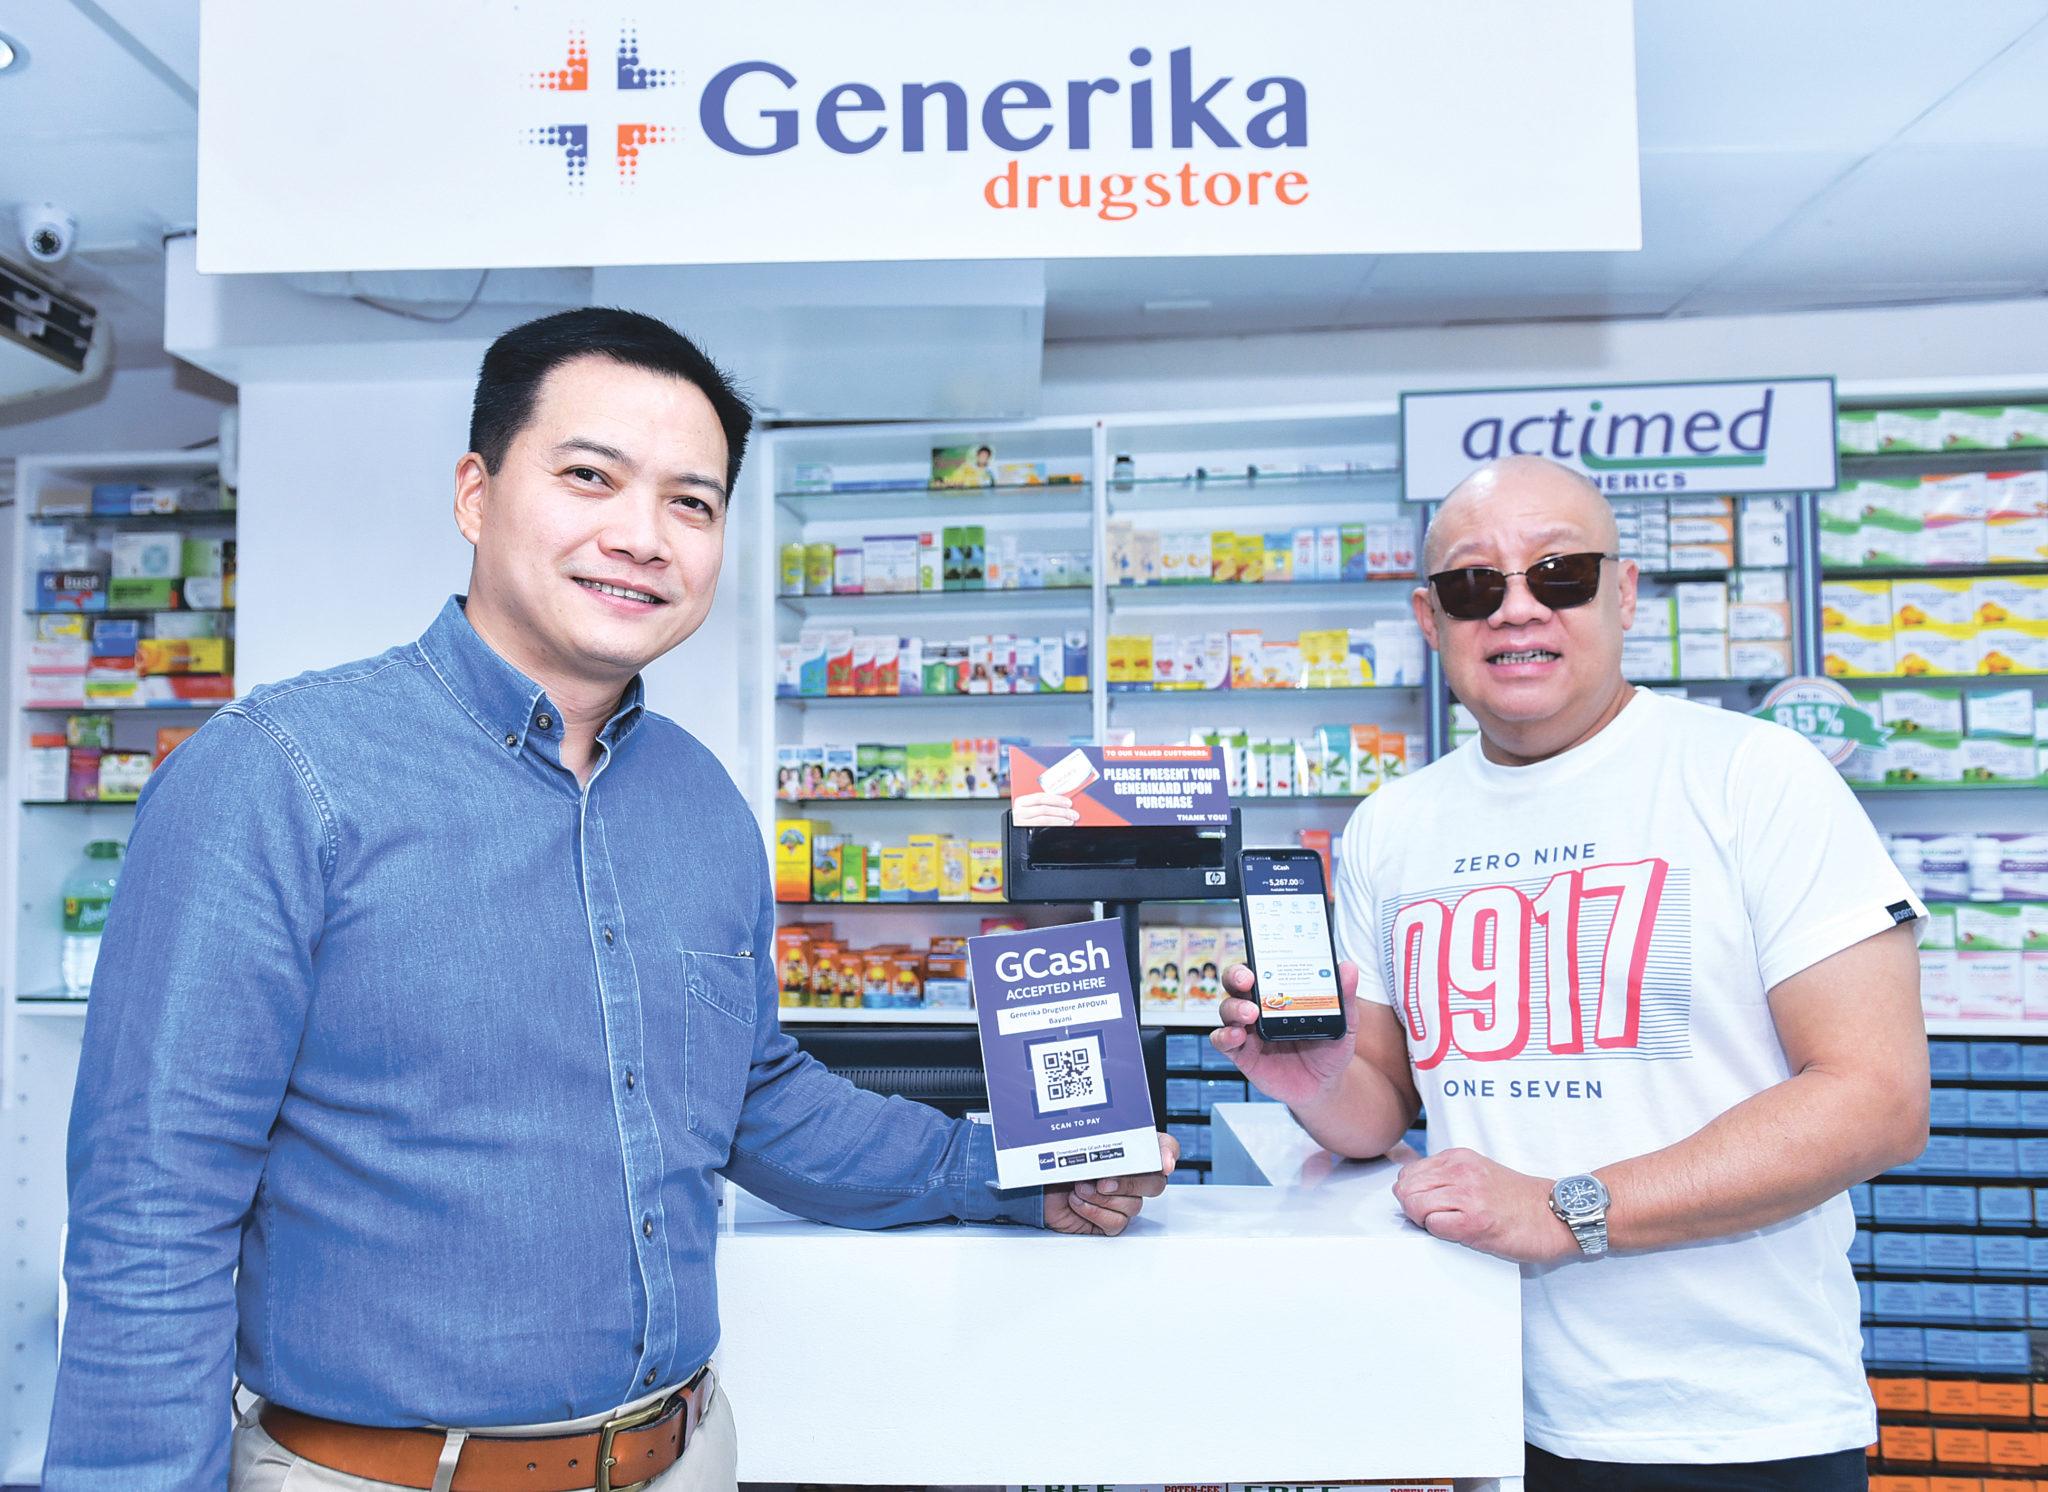 Generika drugstore partners with GCash | BusinessMirror